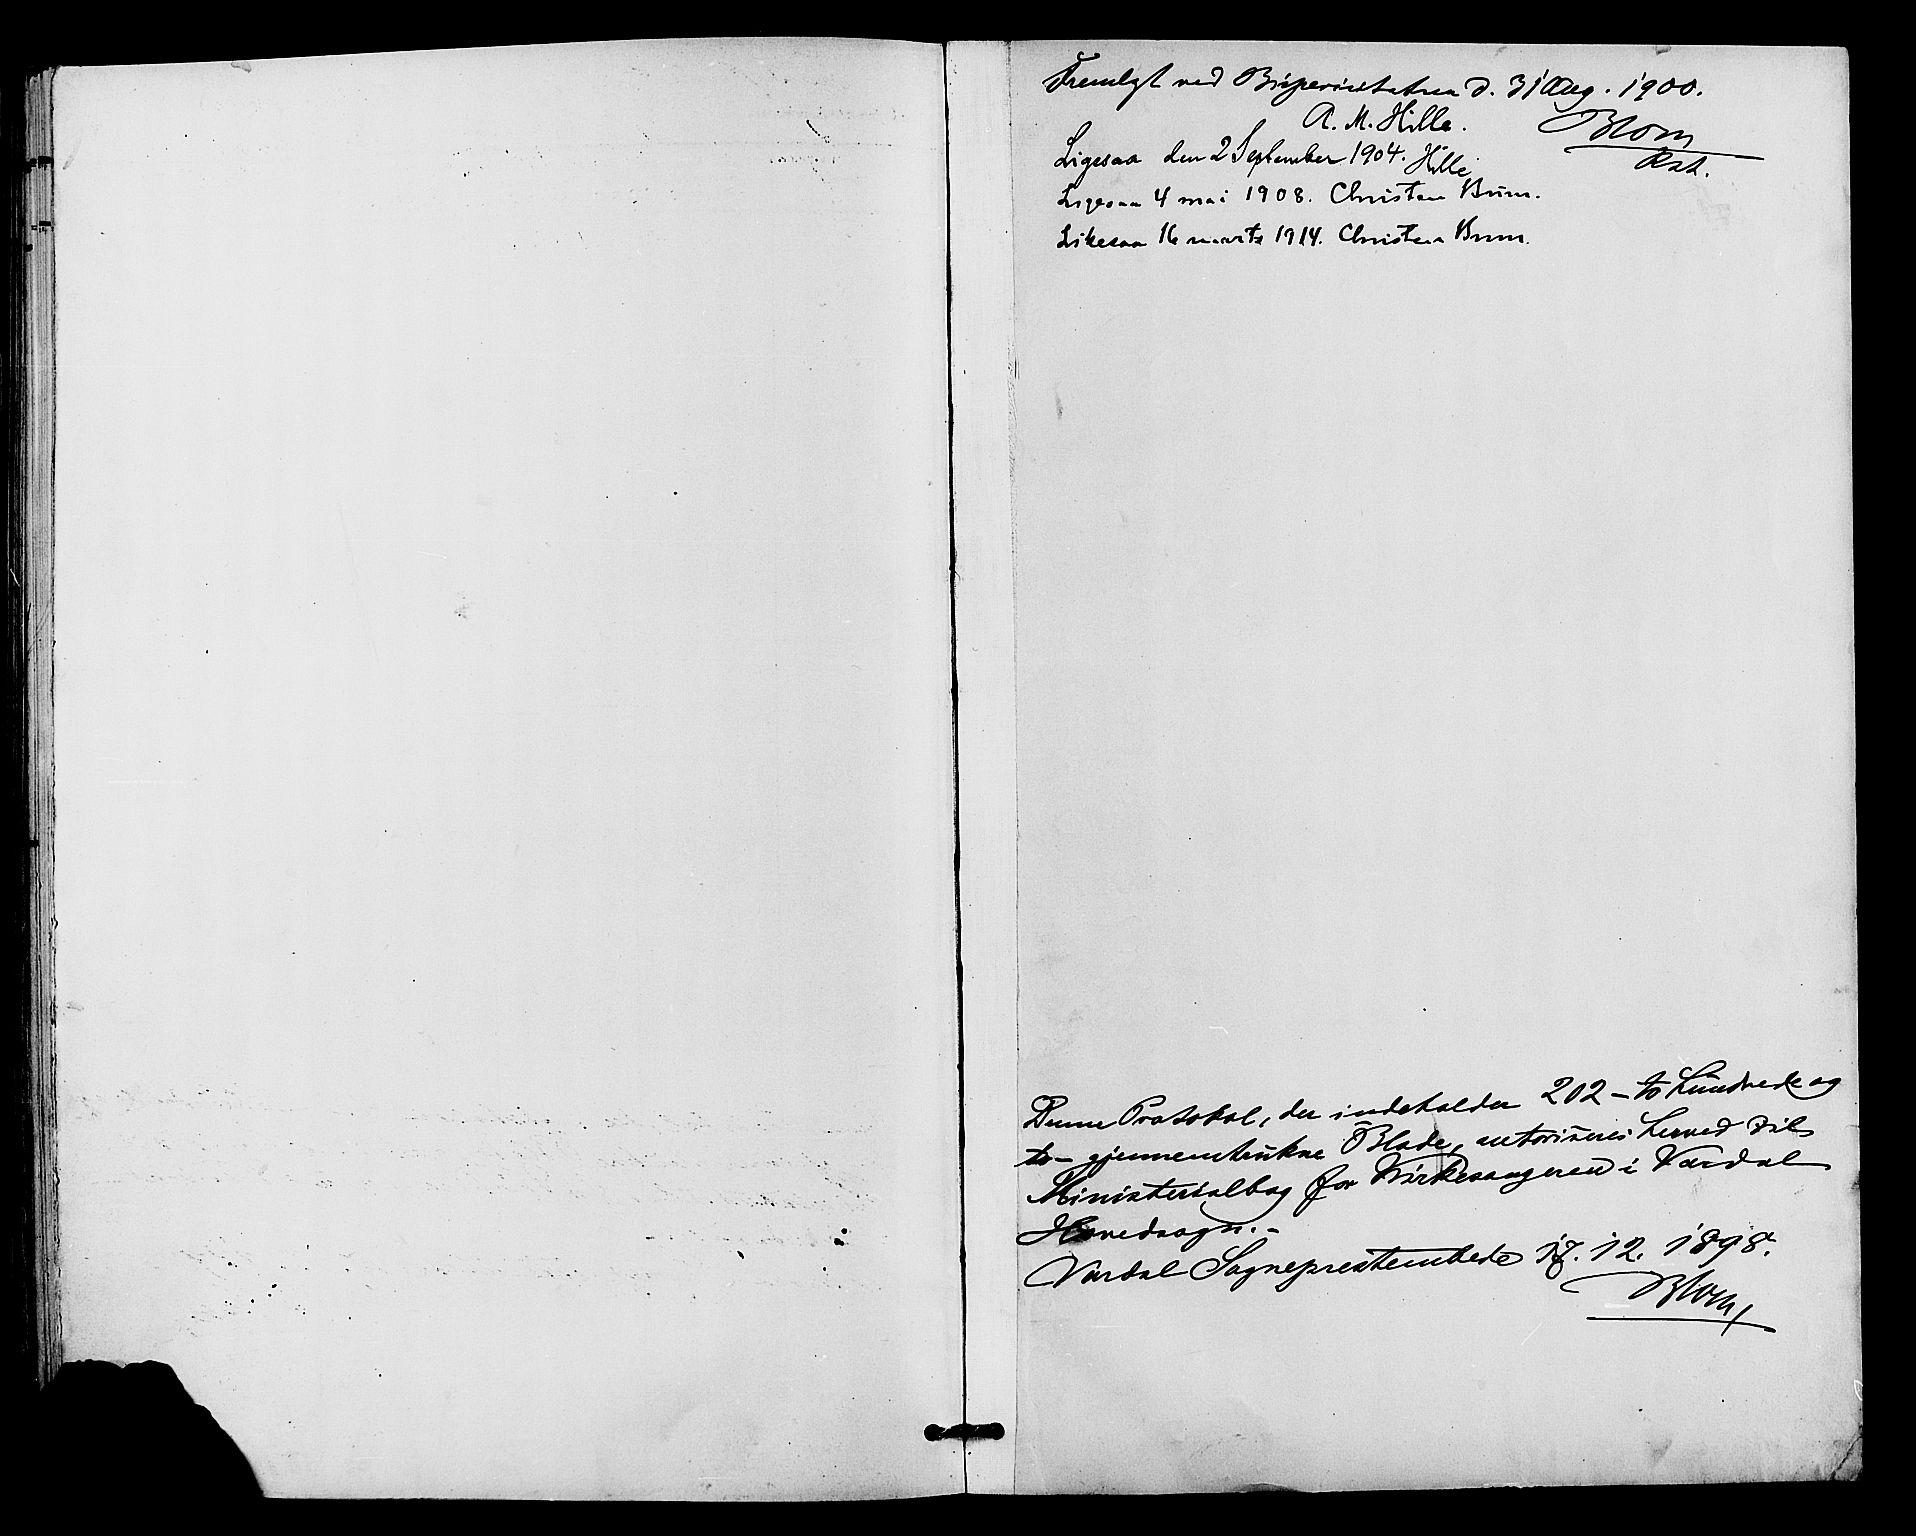 SAH, Vardal prestekontor, H/Ha/Hab/L0011: Klokkerbok nr. 11, 1899-1913